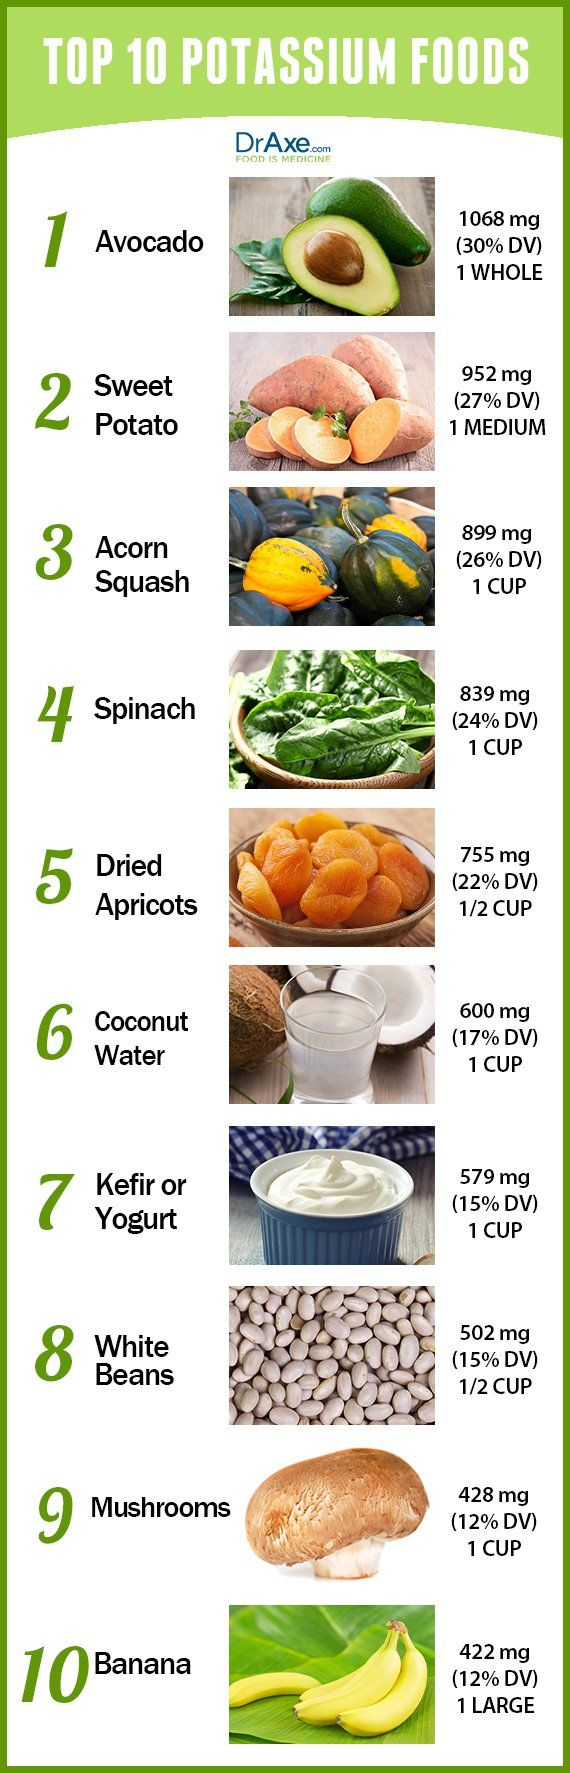 Top 10 Potassium-Rich Foods & Potassium Benefits | Food ...